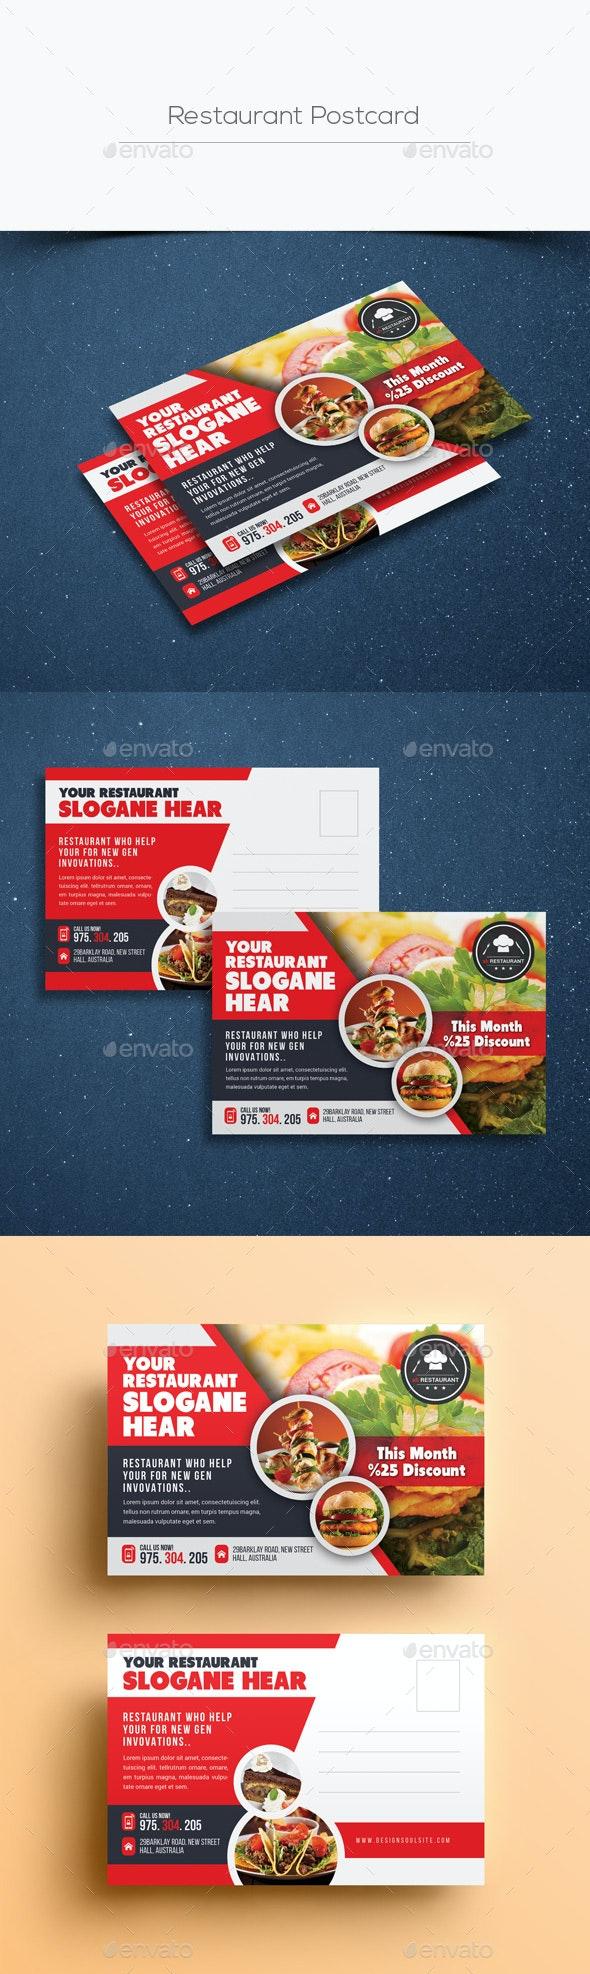 Restaurant Postcard Templates - Cards & Invites Print Templates